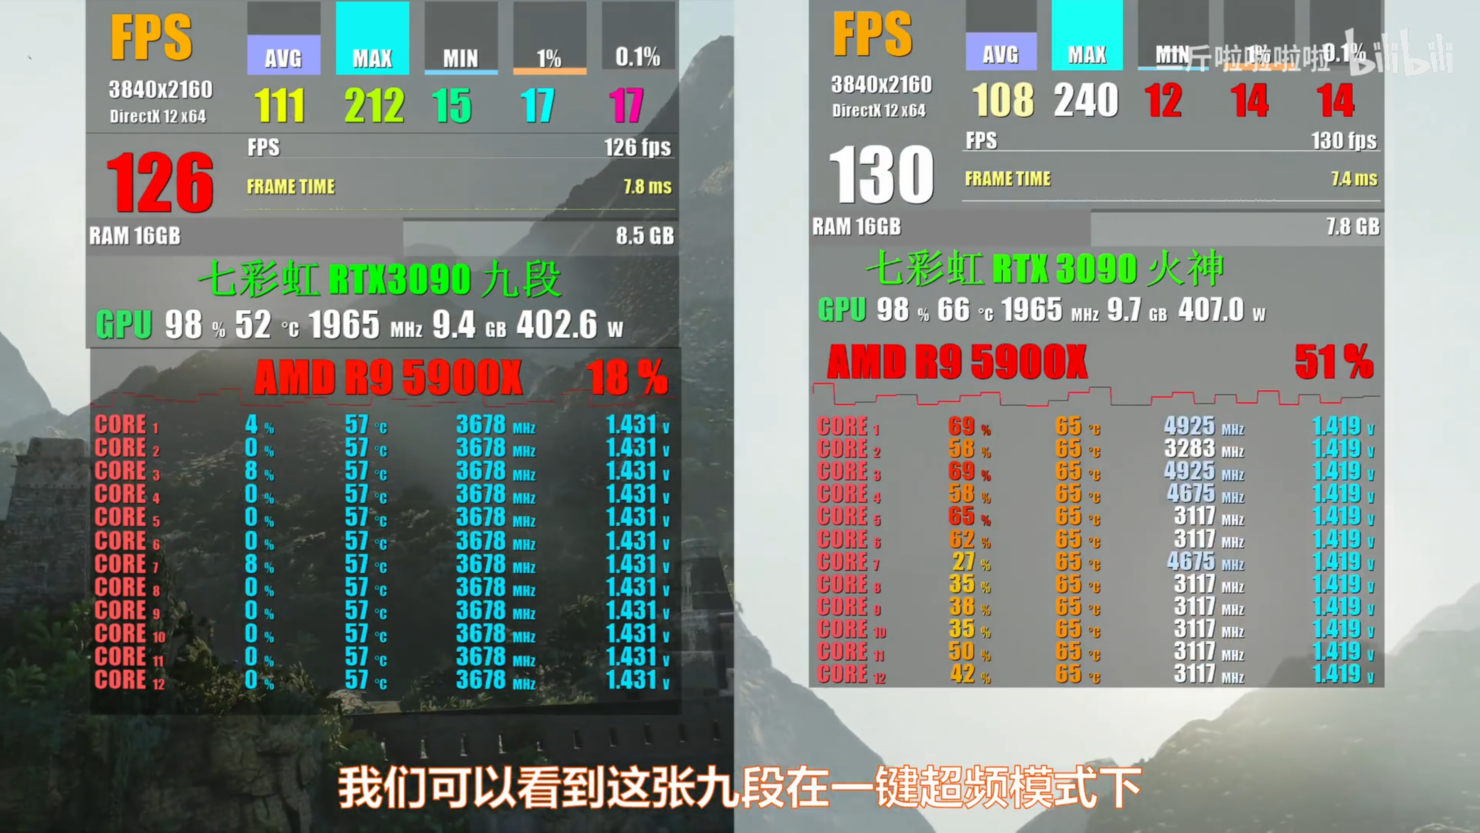 colorful-igame-geforce-rtx-3090-kudan-graphics-card-benchmarks-_7